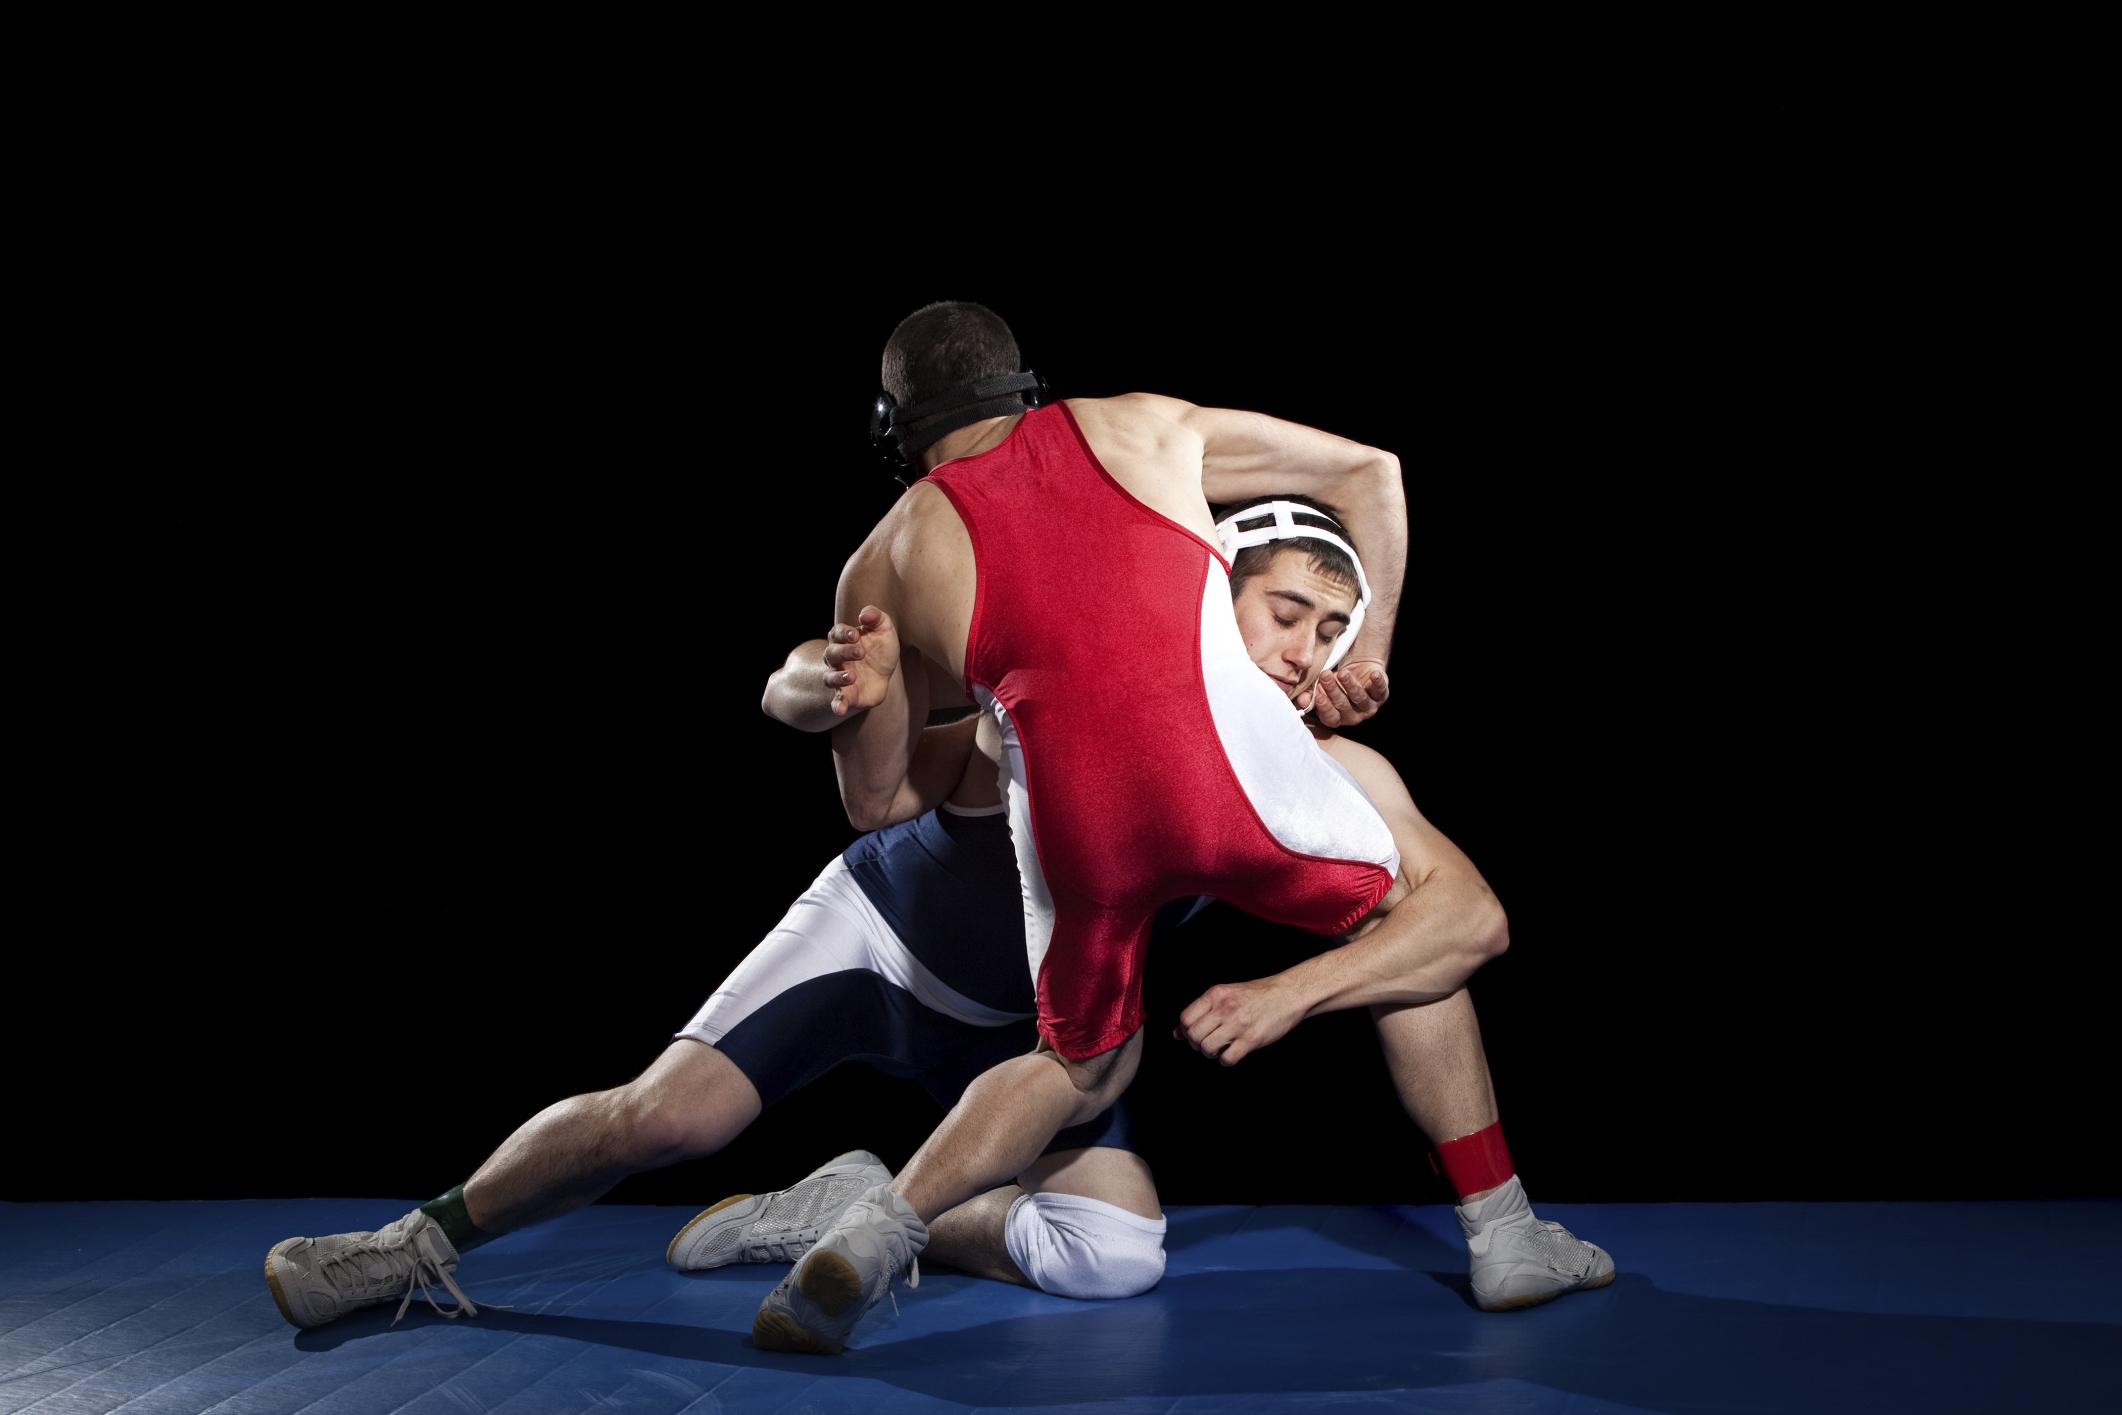 Ten Disadvantages to Wrestling